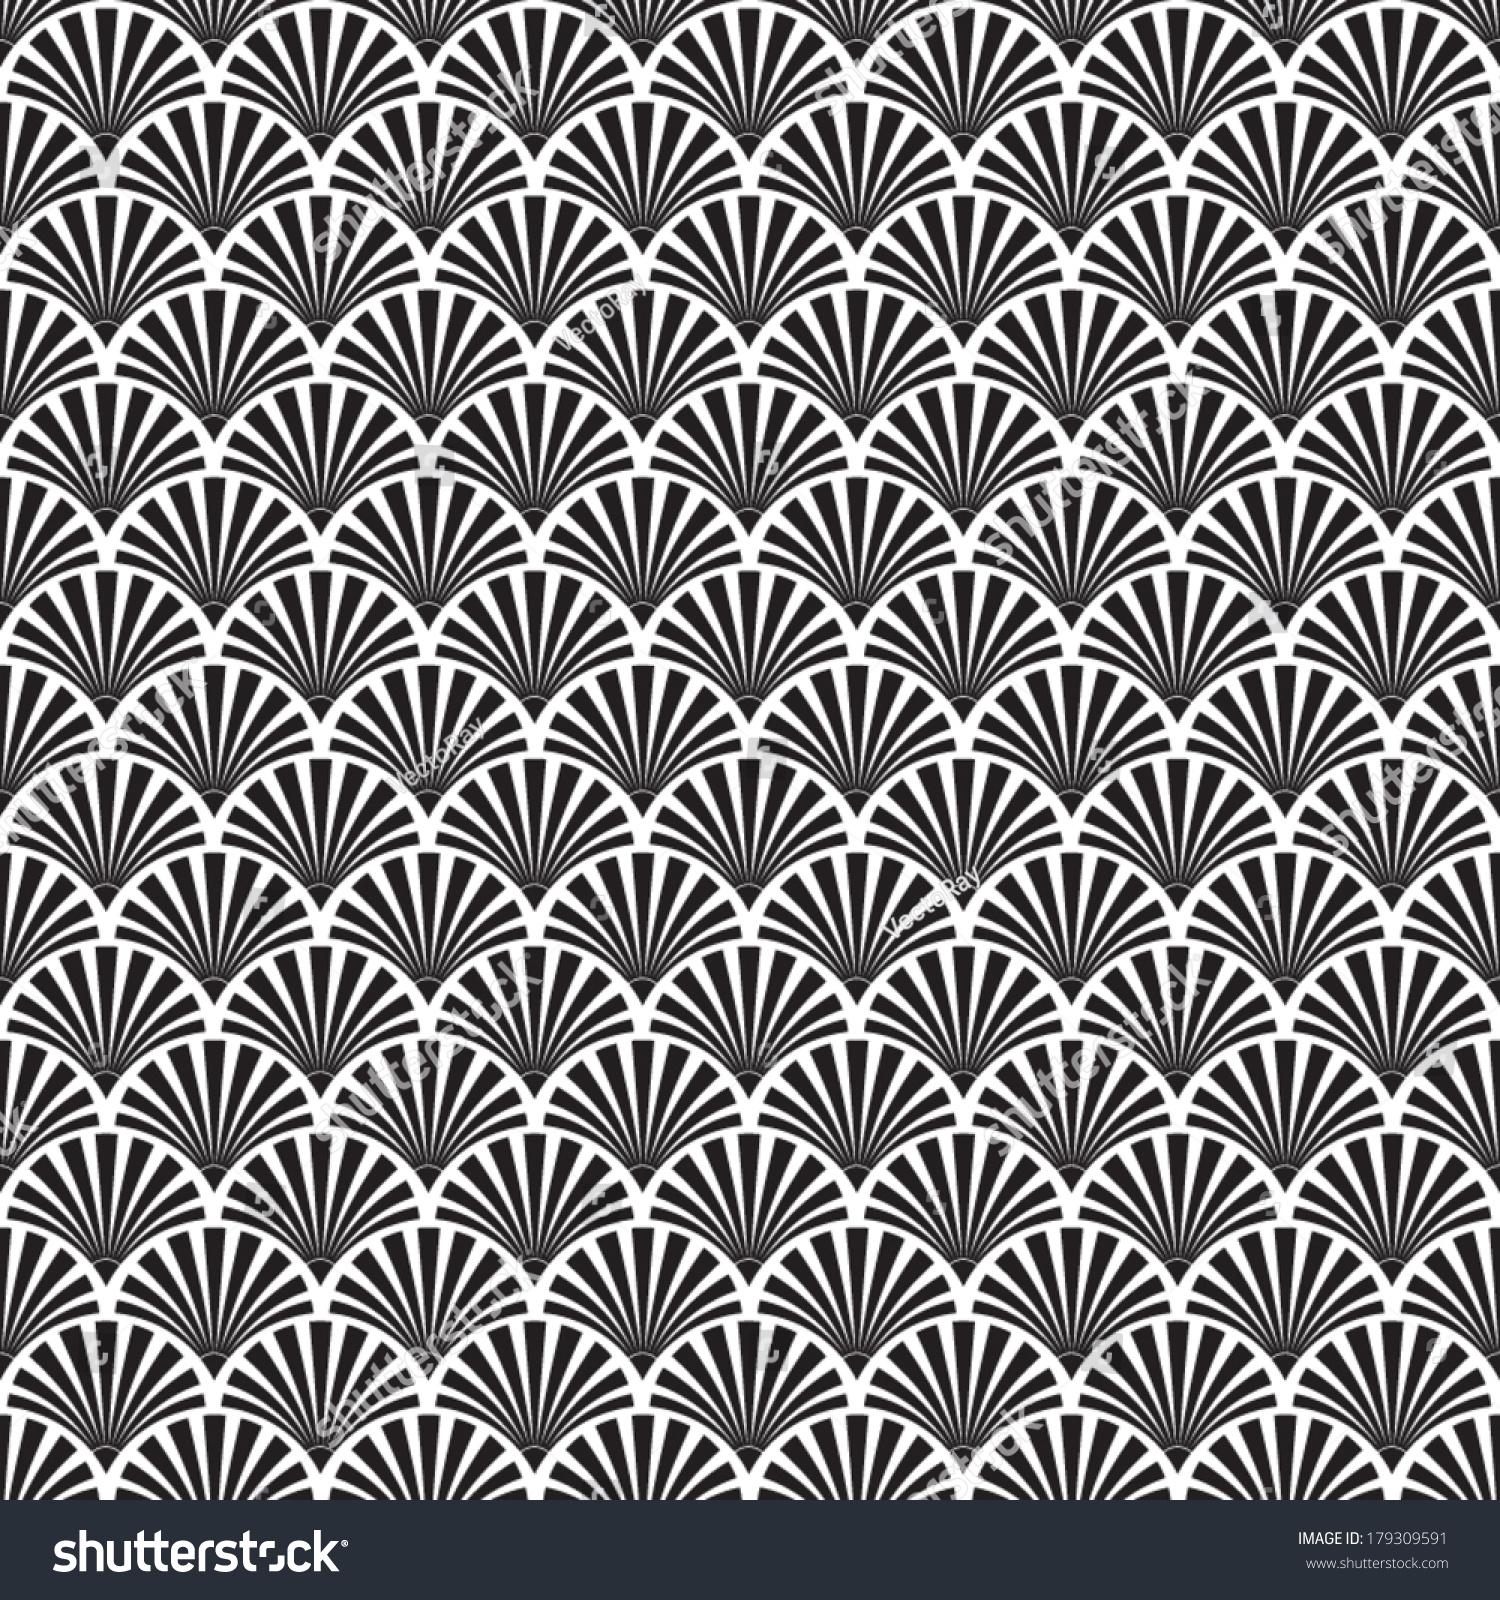 Abstract Seamless Black White Art Deco Stock Vector 179309591 ...